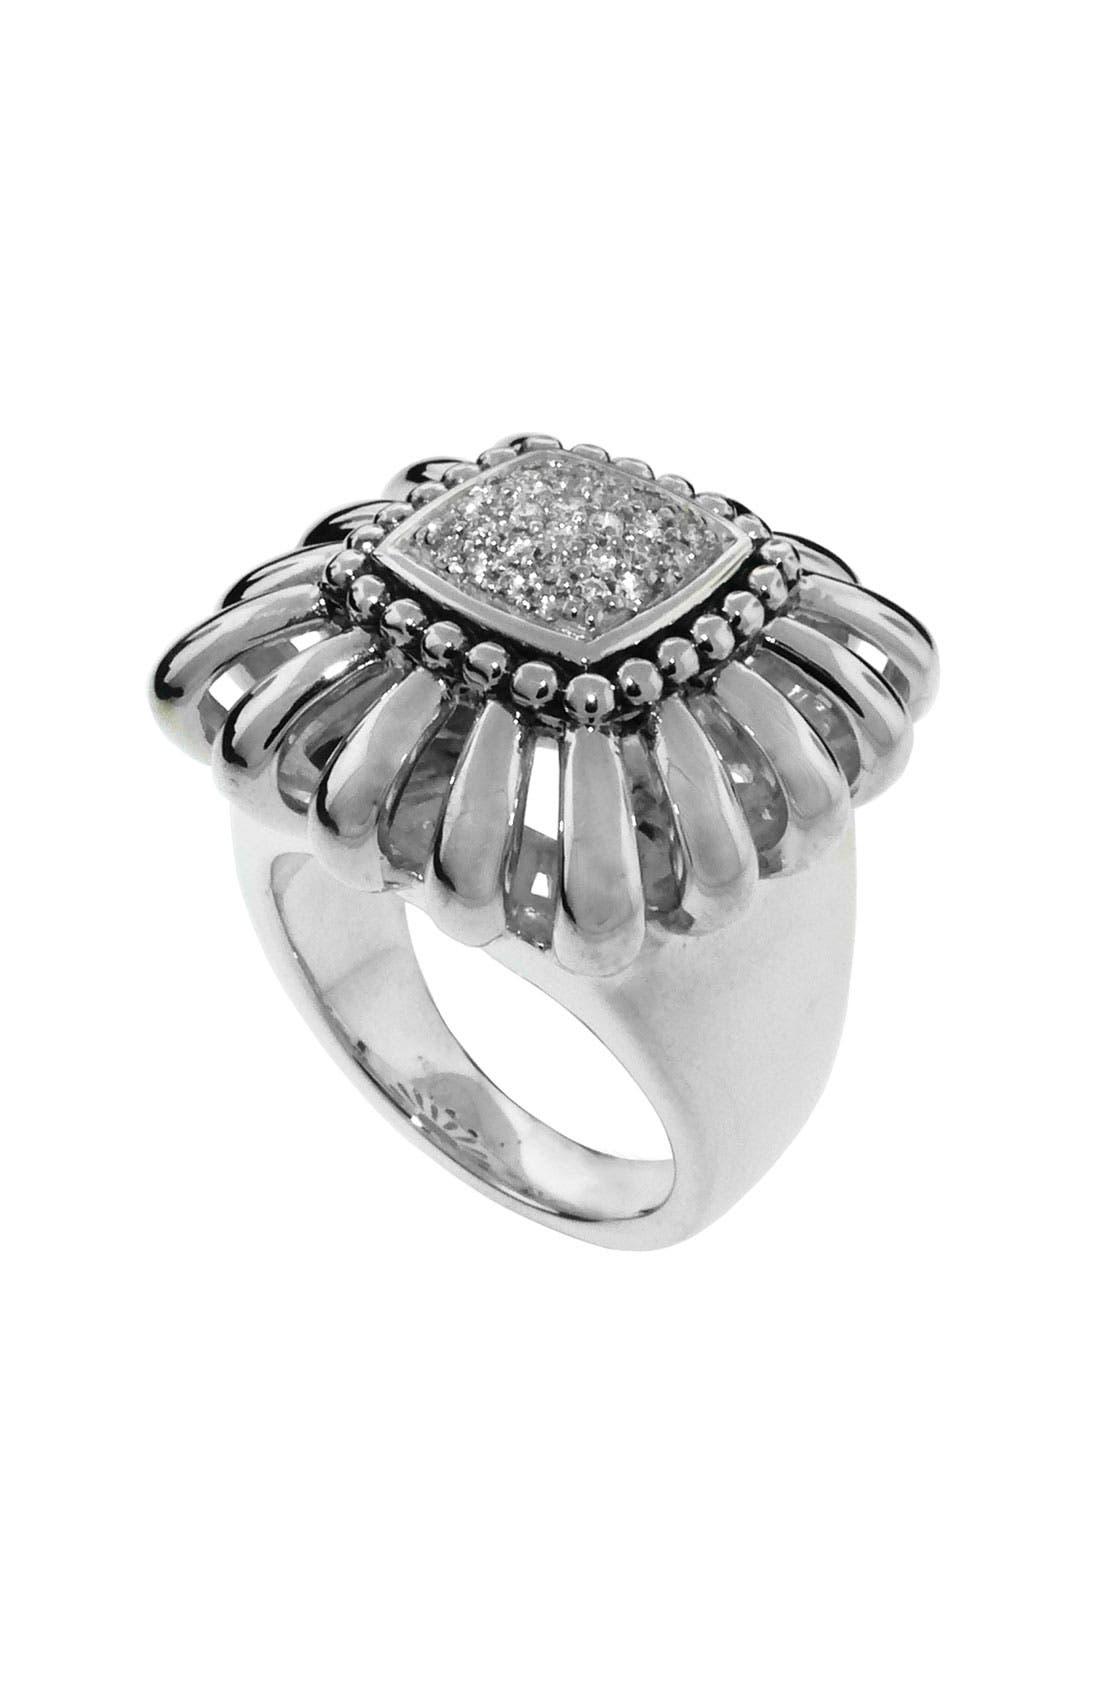 Main Image - LAGOS 'Prêt-à-Porter' Diamond Daisy Cocktail Ring